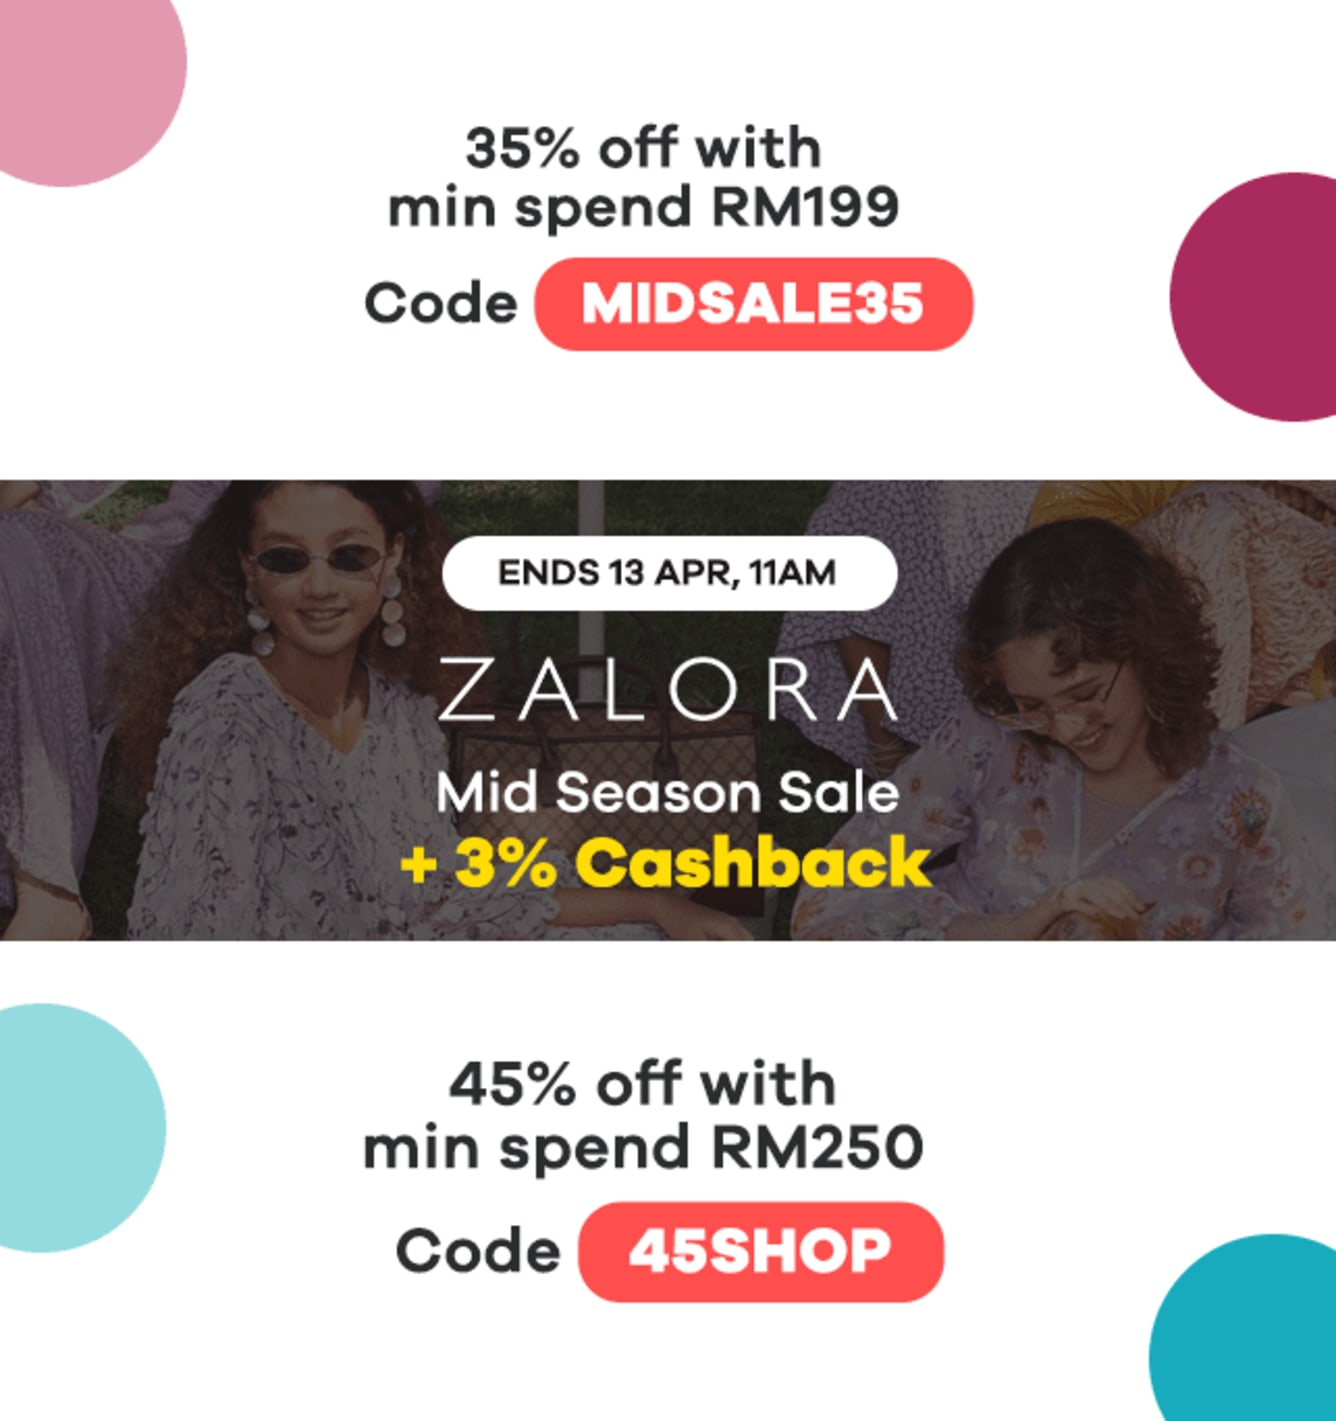 Zalora Mid Season Sale: 3% Cashback